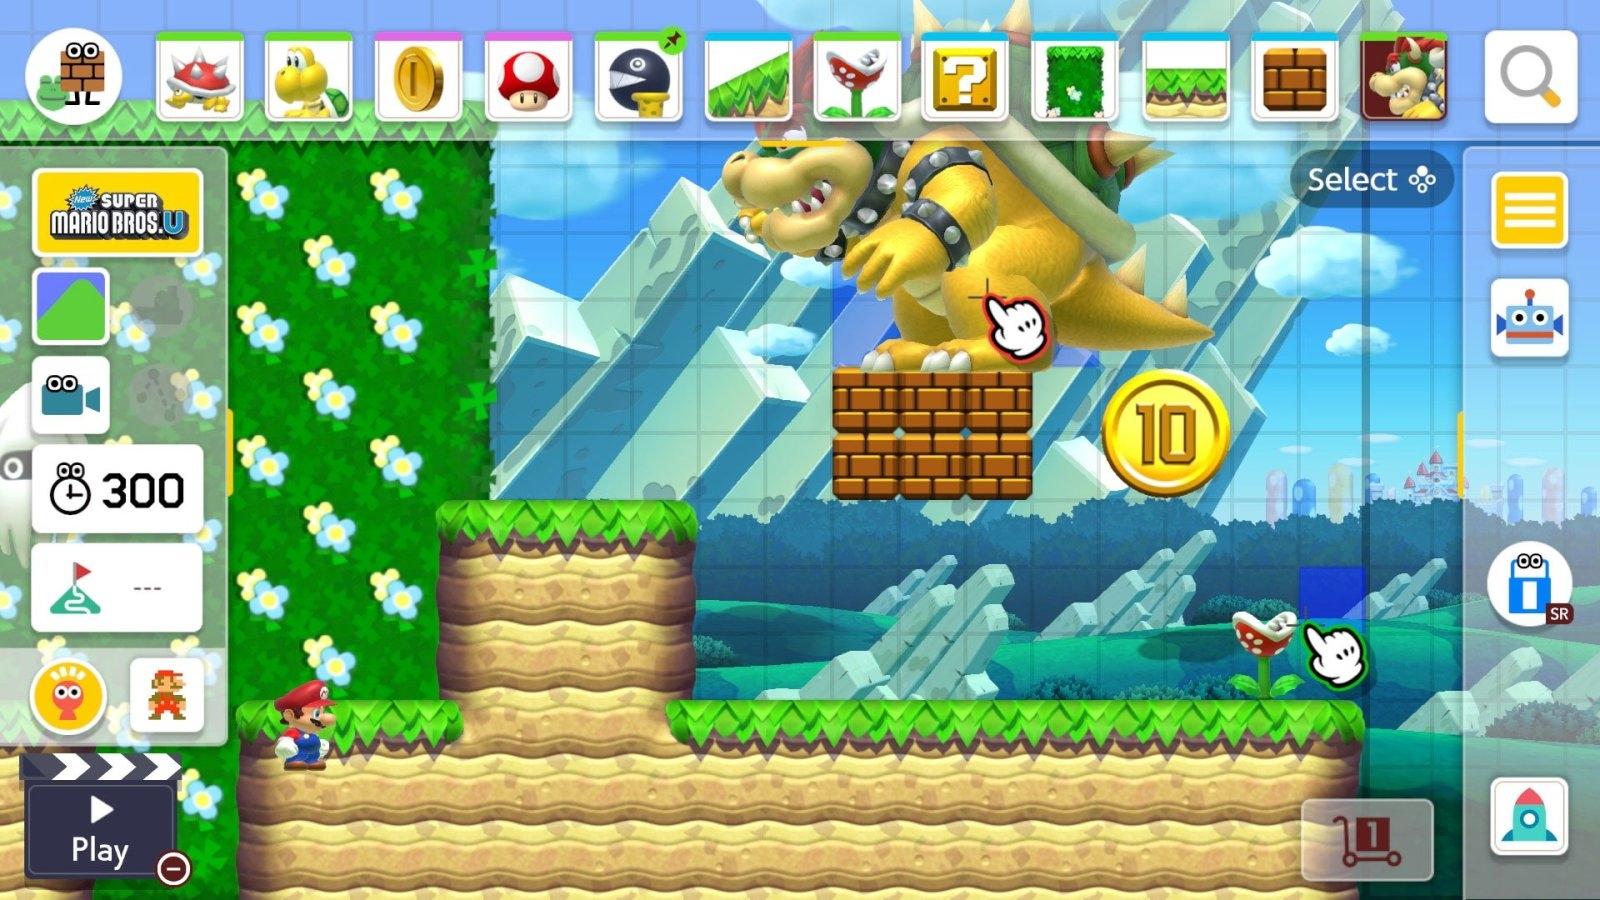 'Super Mario Maker 2' has a story mode and online multiplayer | DeviceDaily.com